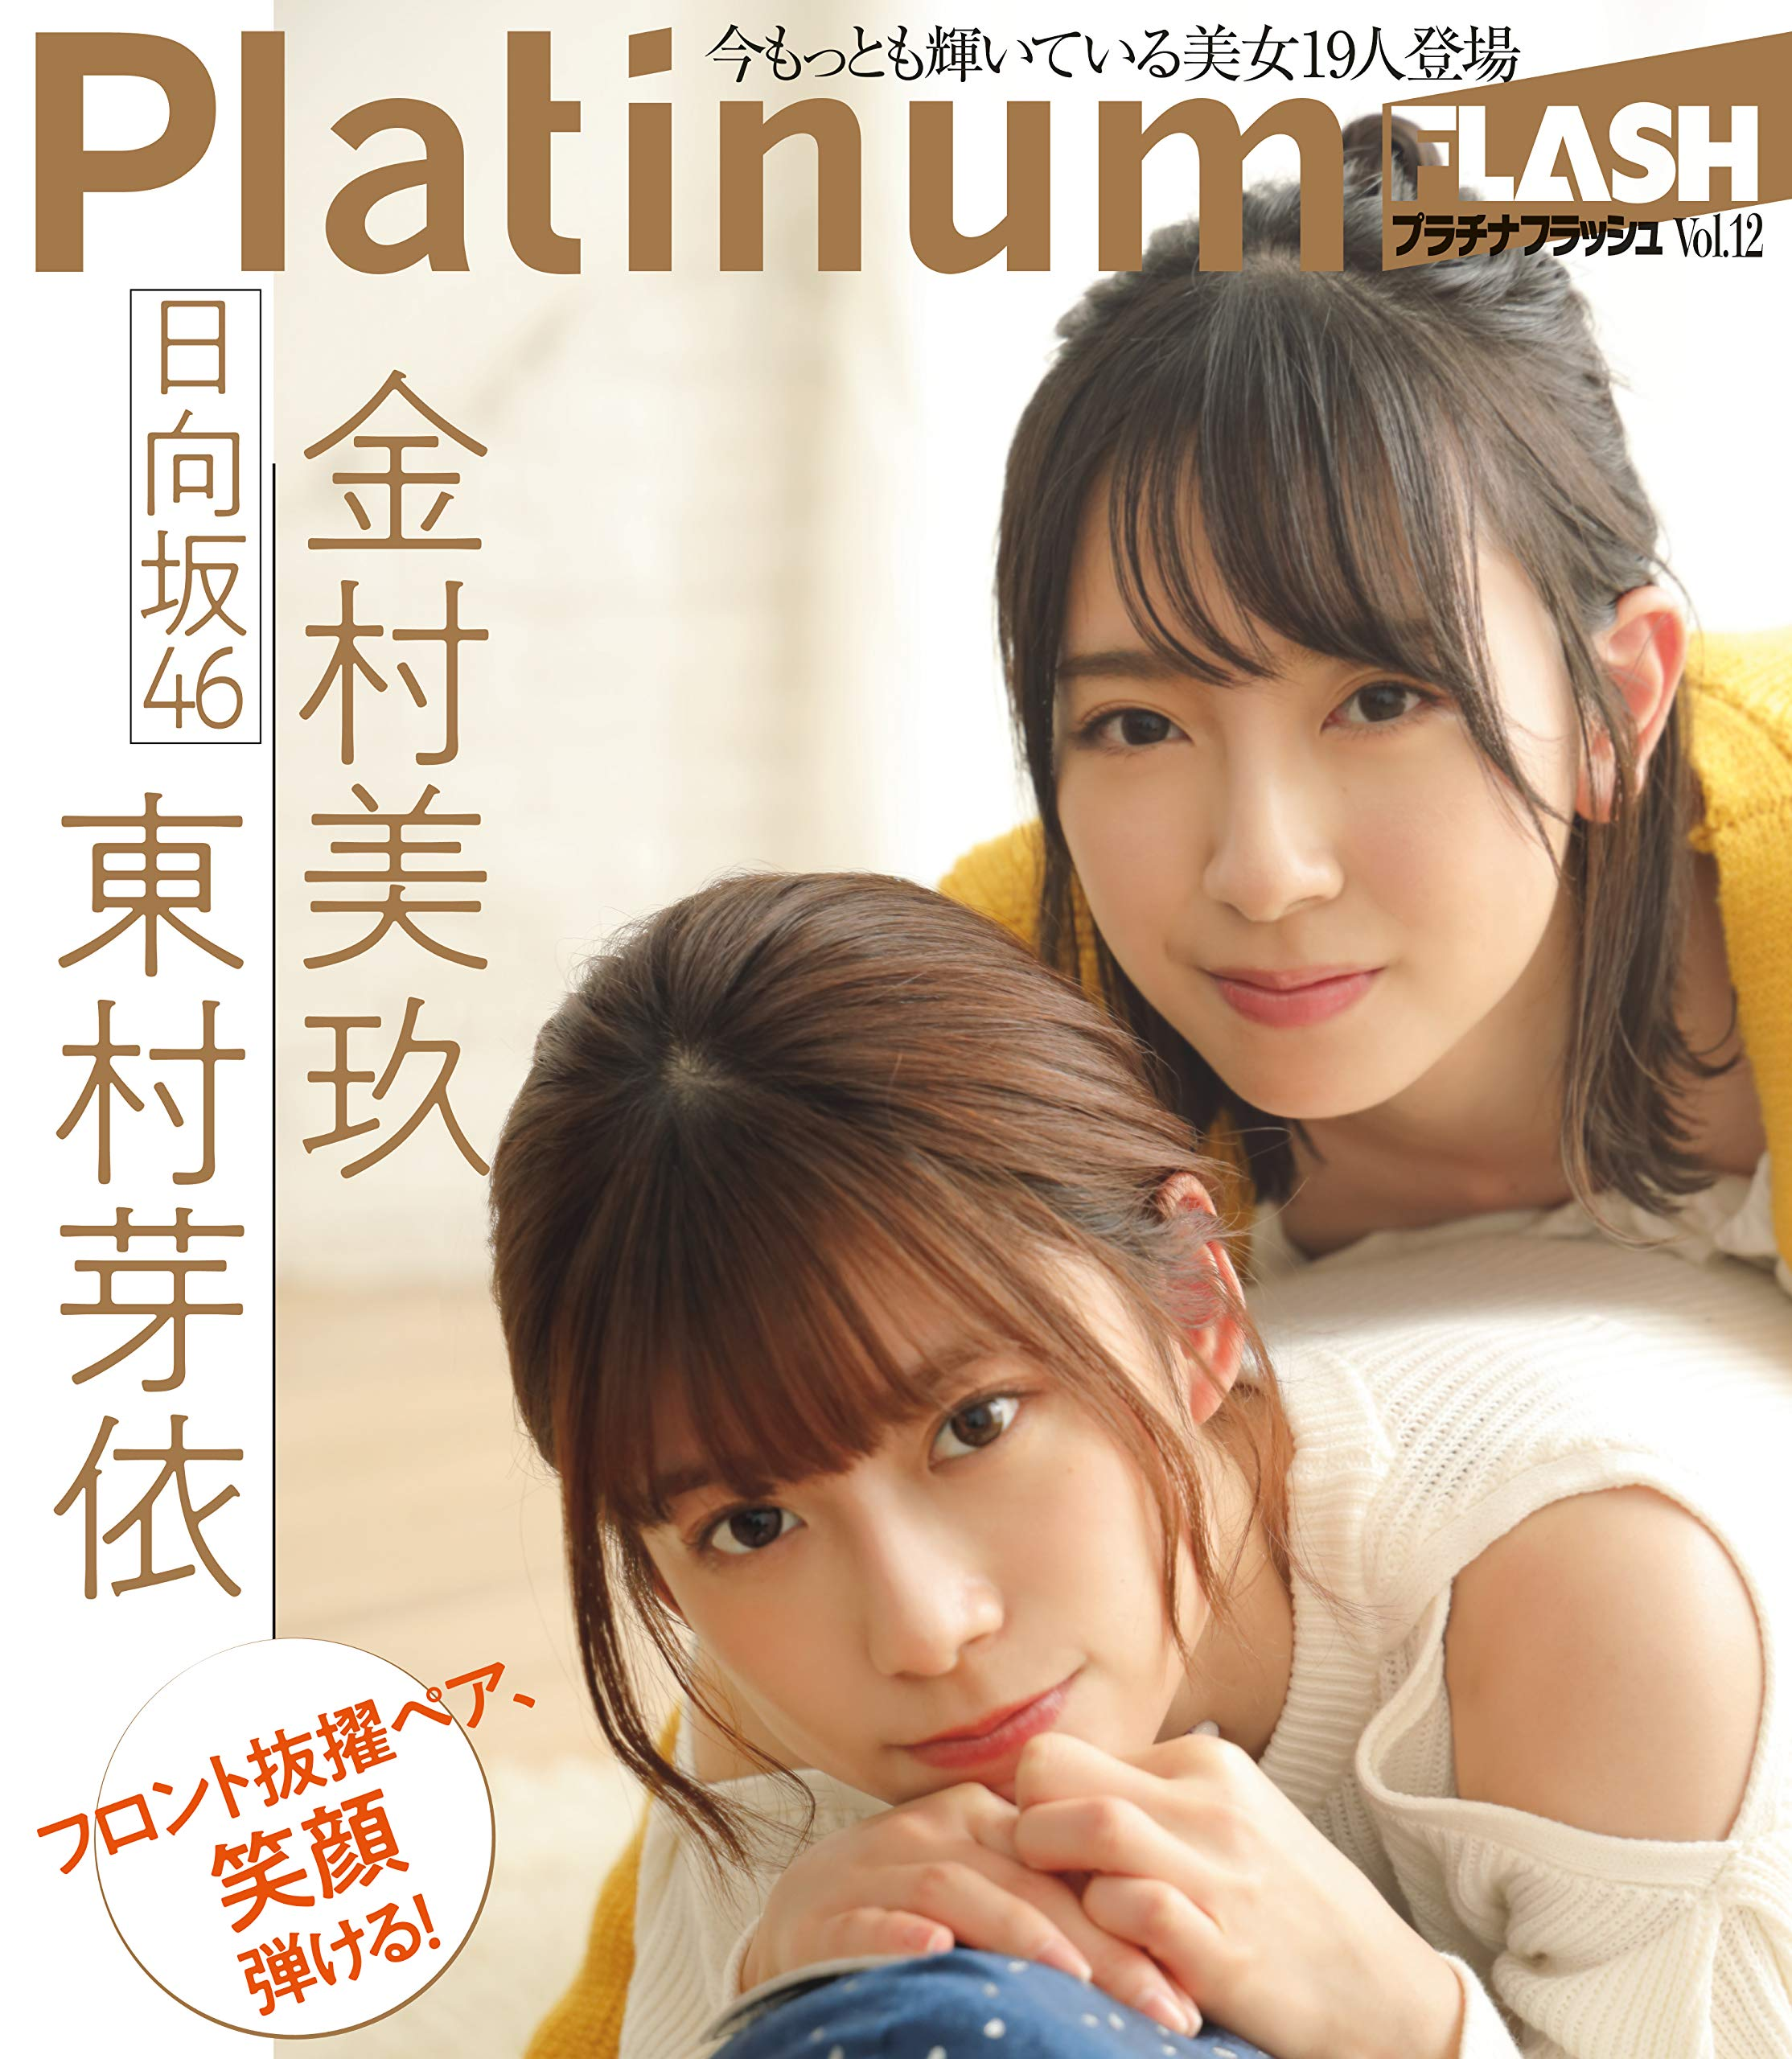 Platinum FLASH Vol.12 裏 日向坂46 金村美玖 東村芽依